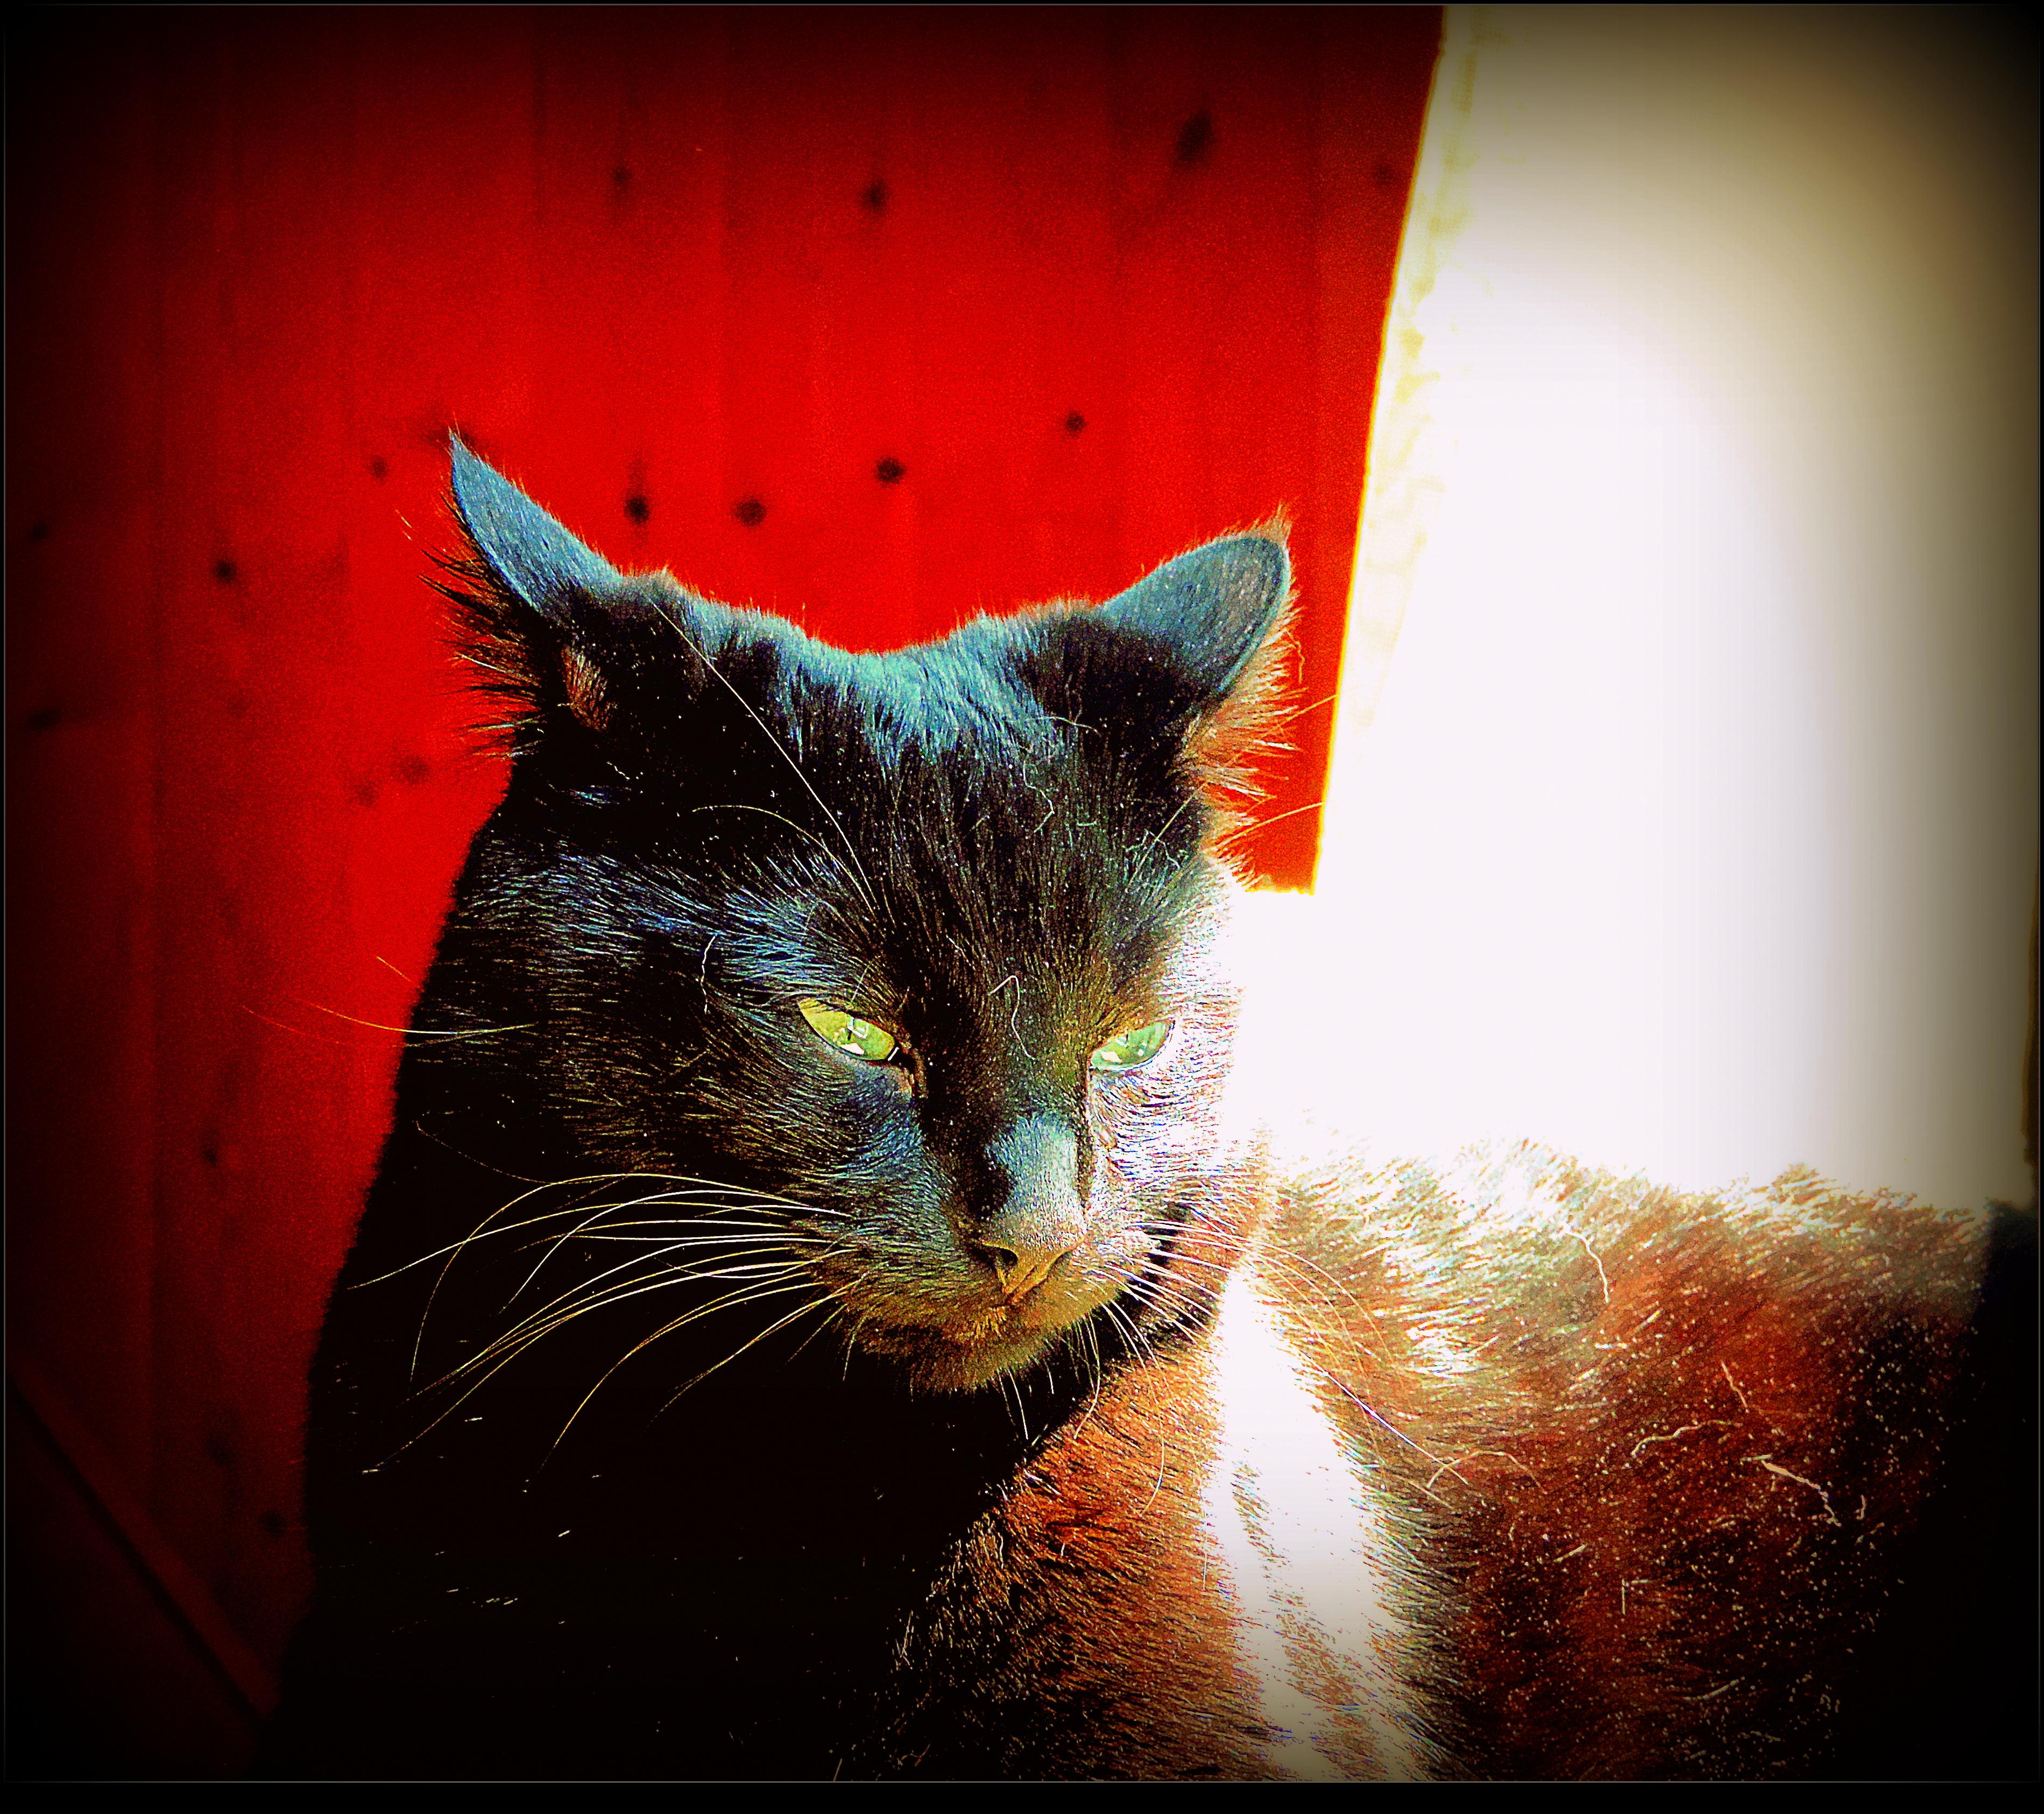 Sun Ray On My Kitty by surrealistic-gloom